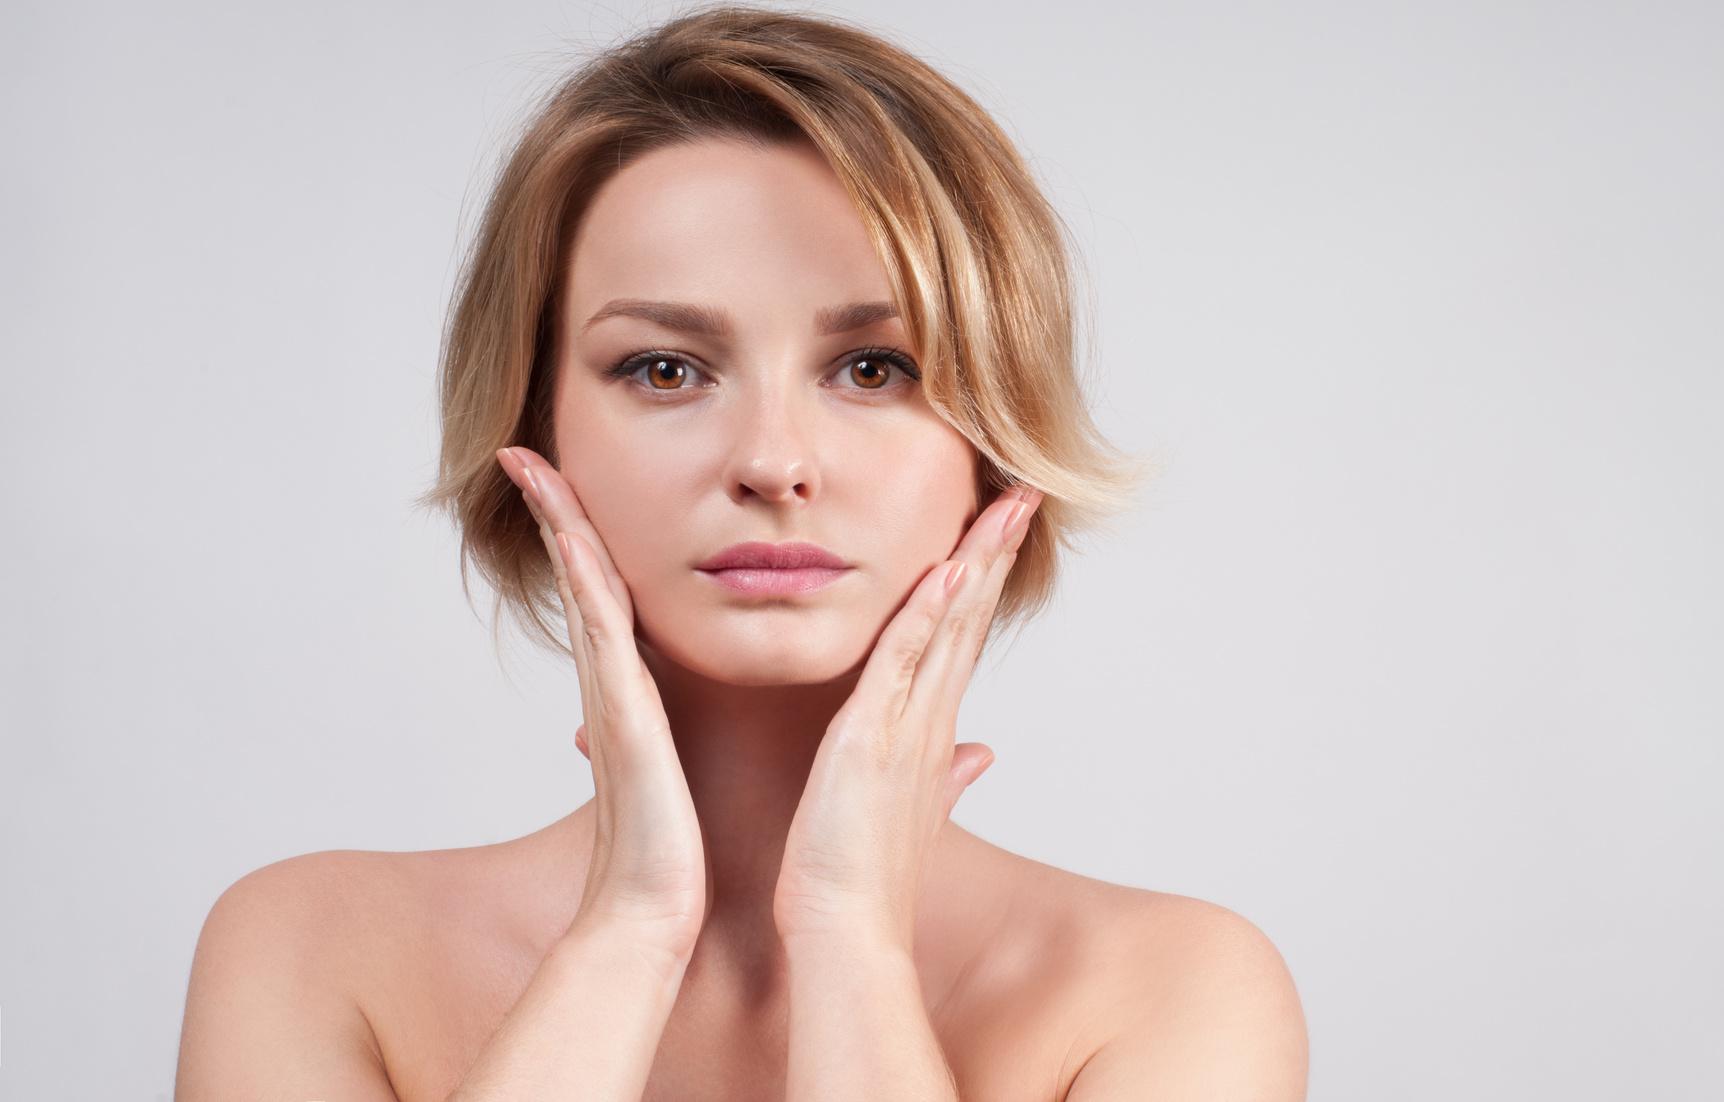 Brak elastyczności skóry - HIFU